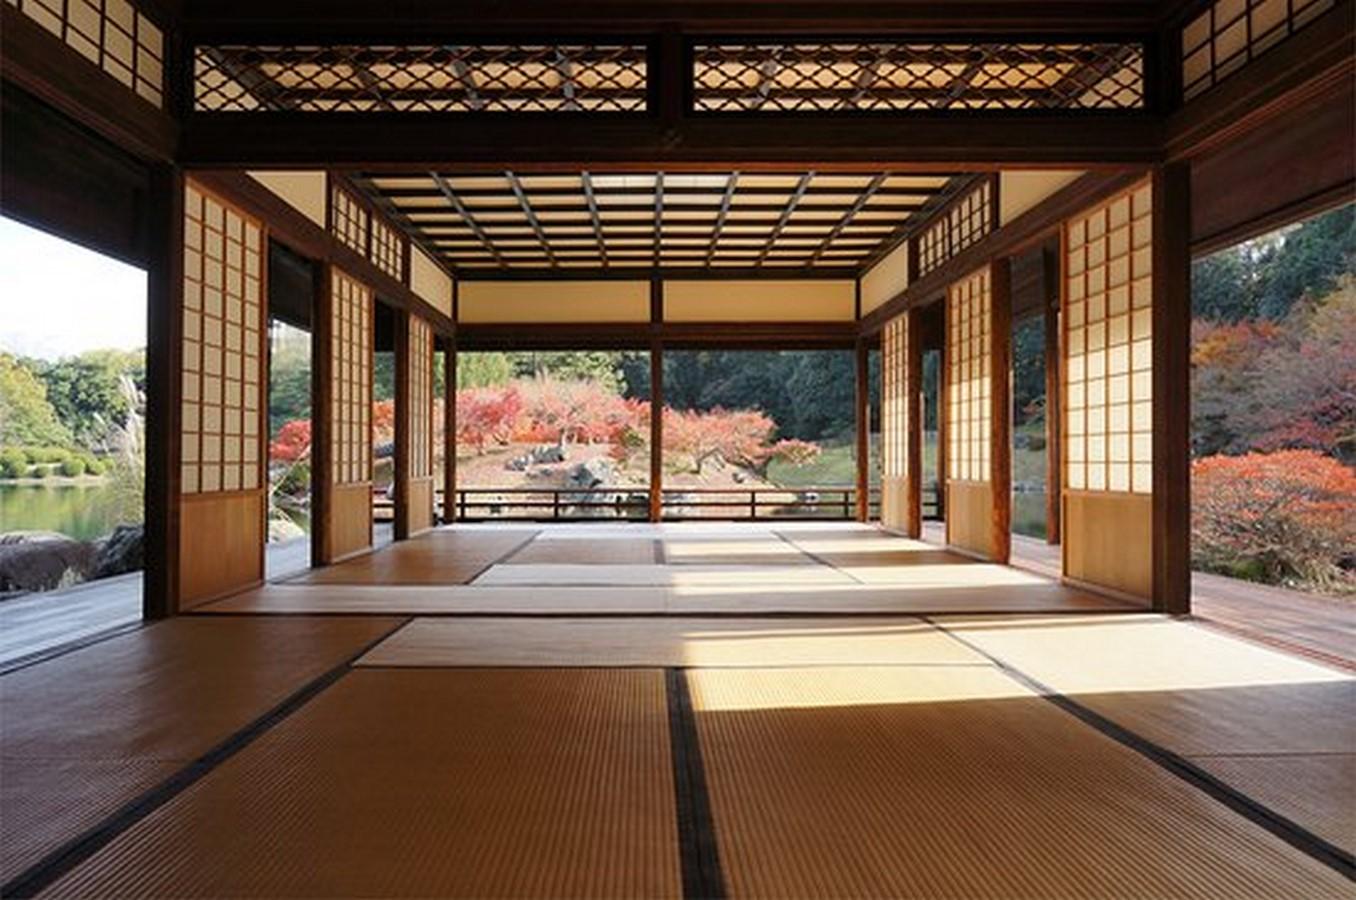 Shoin-zukuri Architecture: Japanese residential architecture - Sheet13